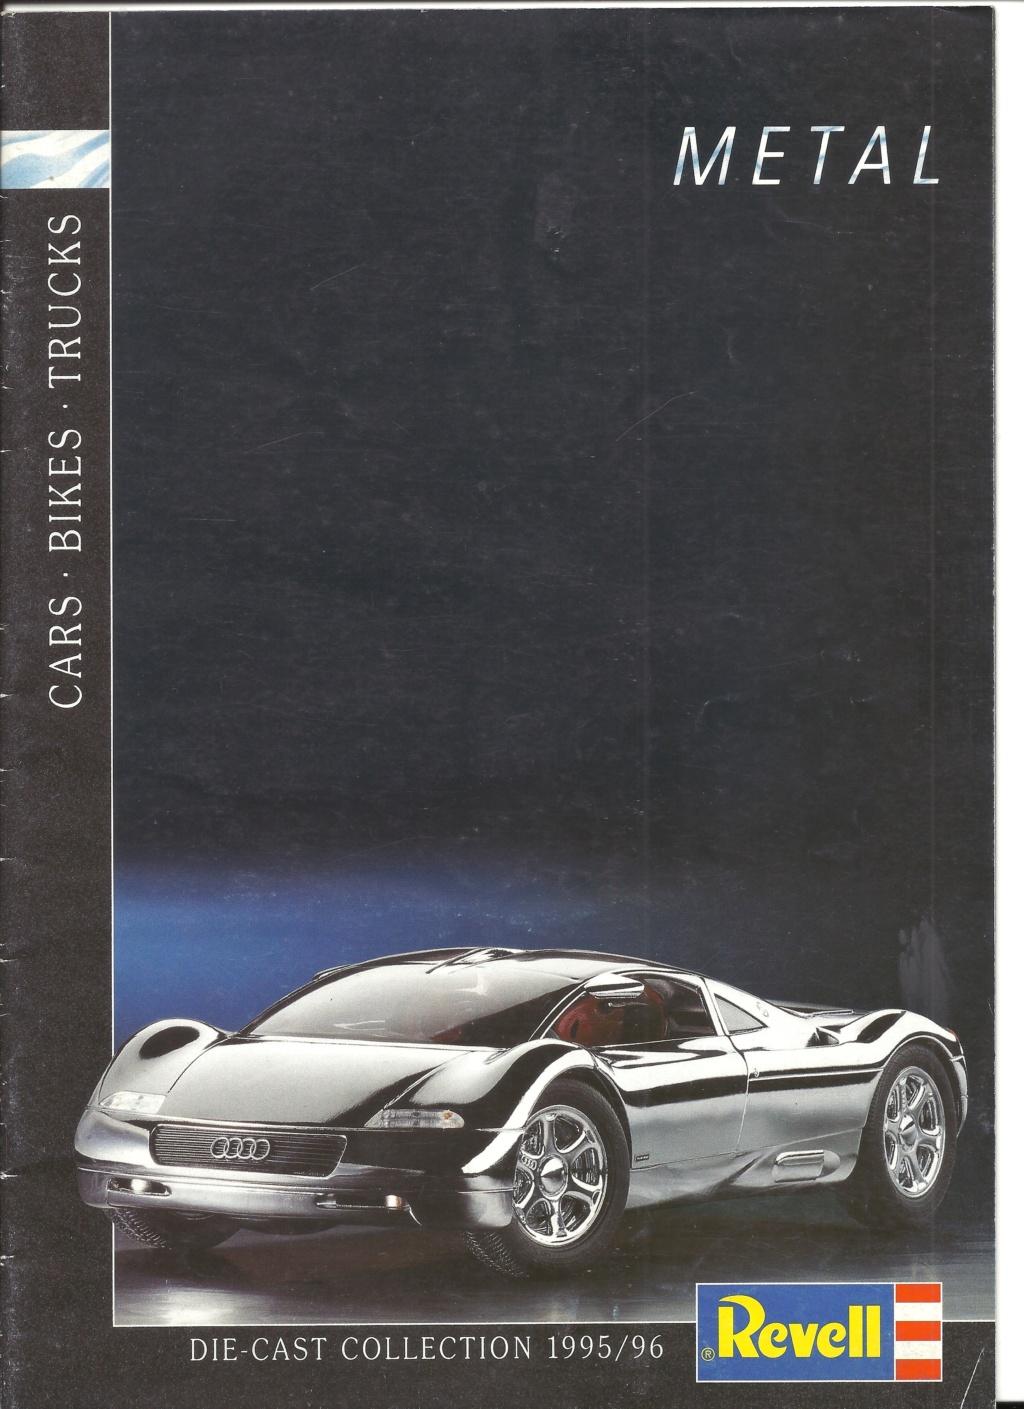 [REVELL 1995] Catalogue METAL miniatures 1995  Revell29